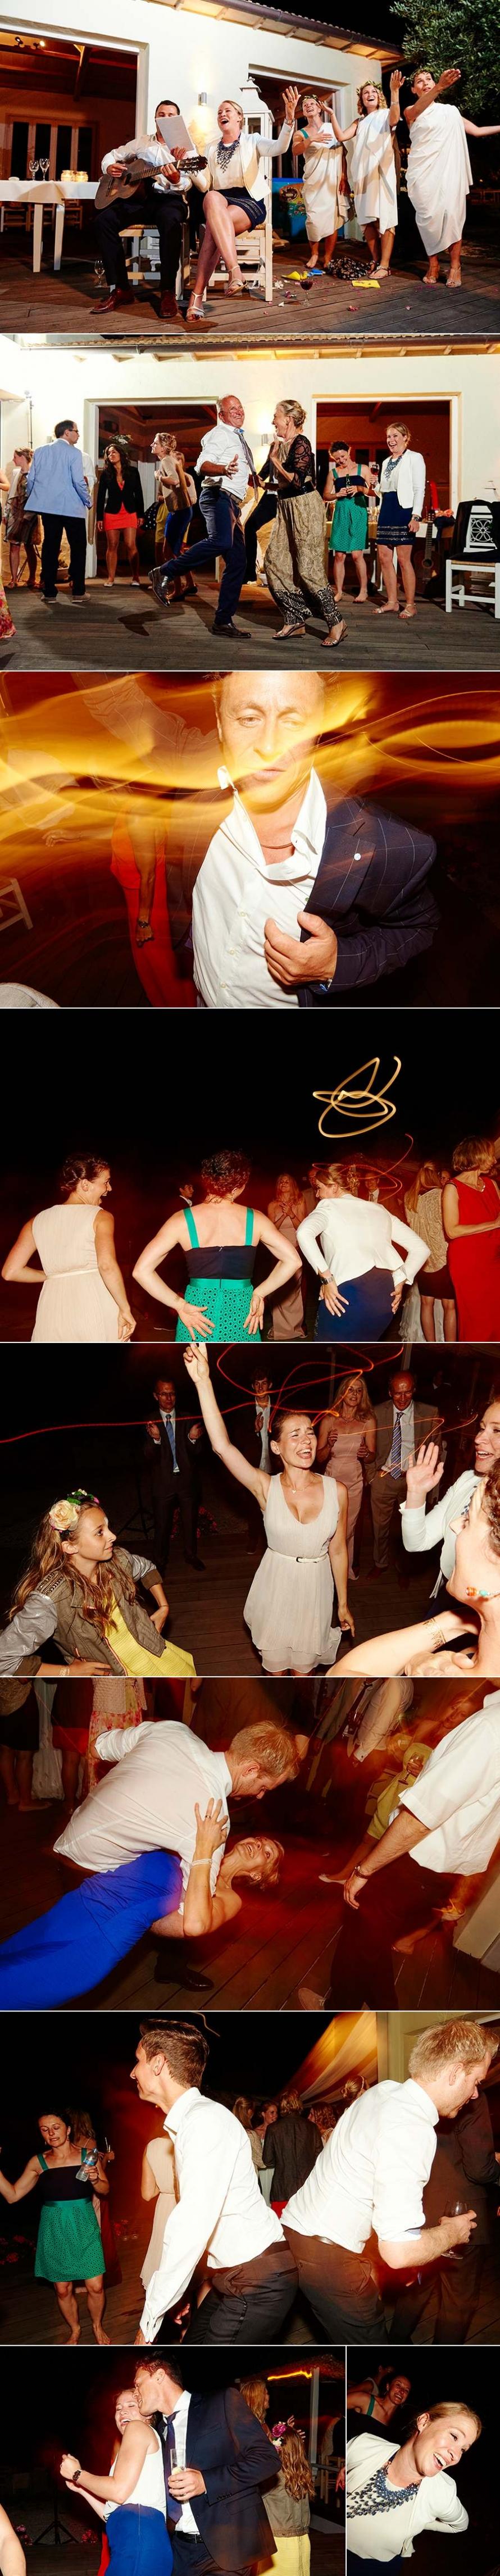 Tobi & Vanessa wedding photos 29